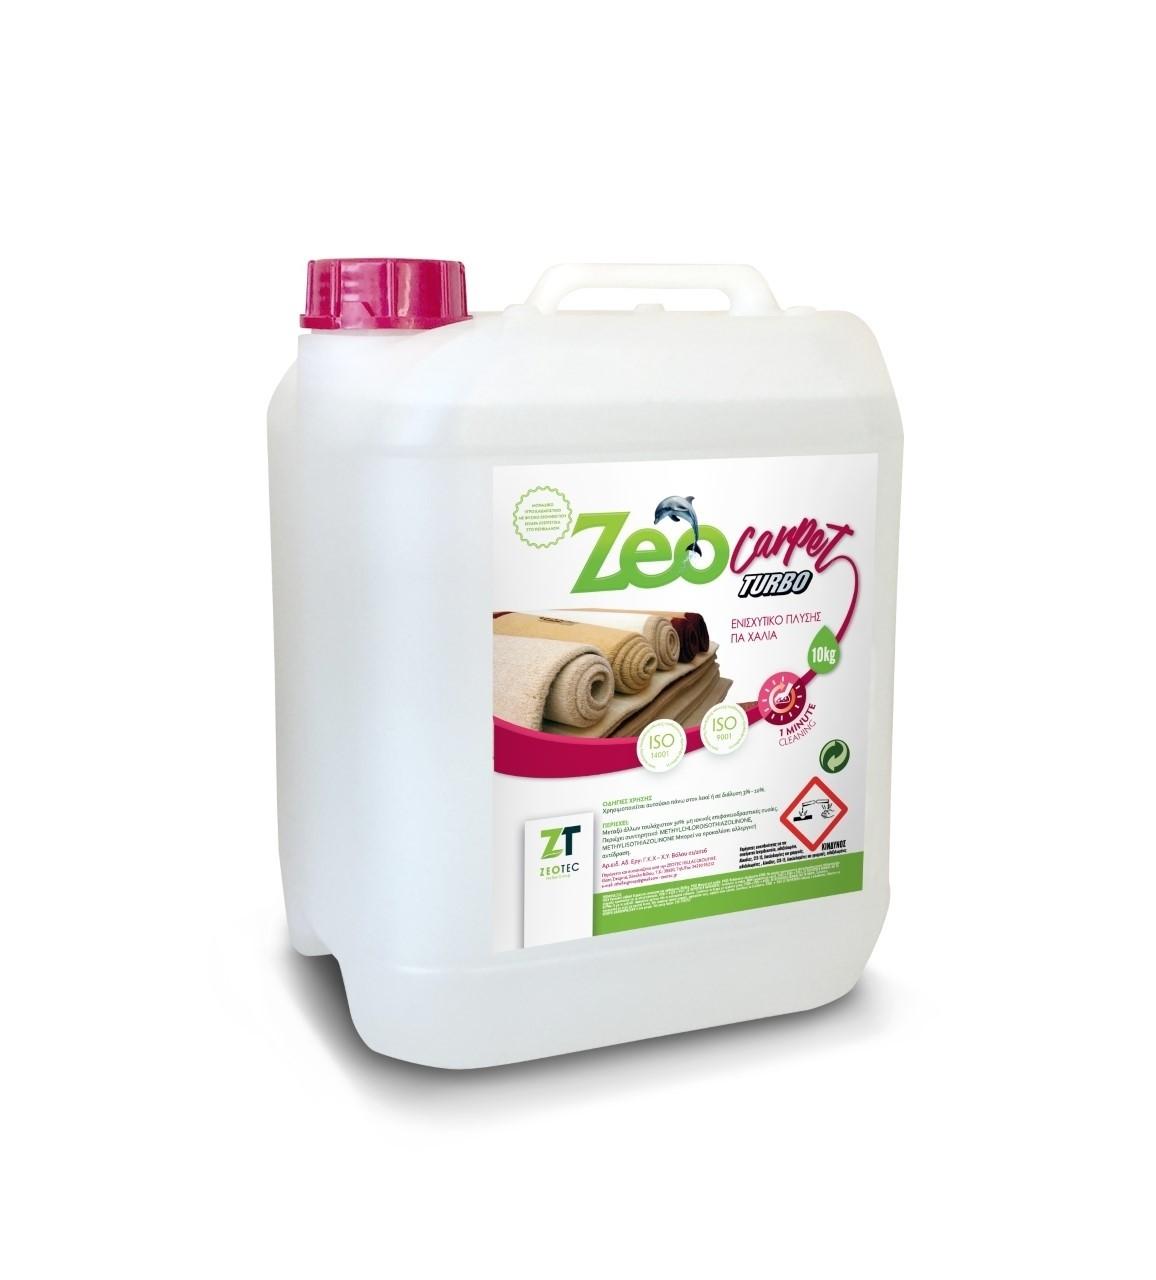 Zeo Carpet Turbo - Ενισχυμένο υγρό πλυντηρίου για χαλιά και μοκέτες 10lt